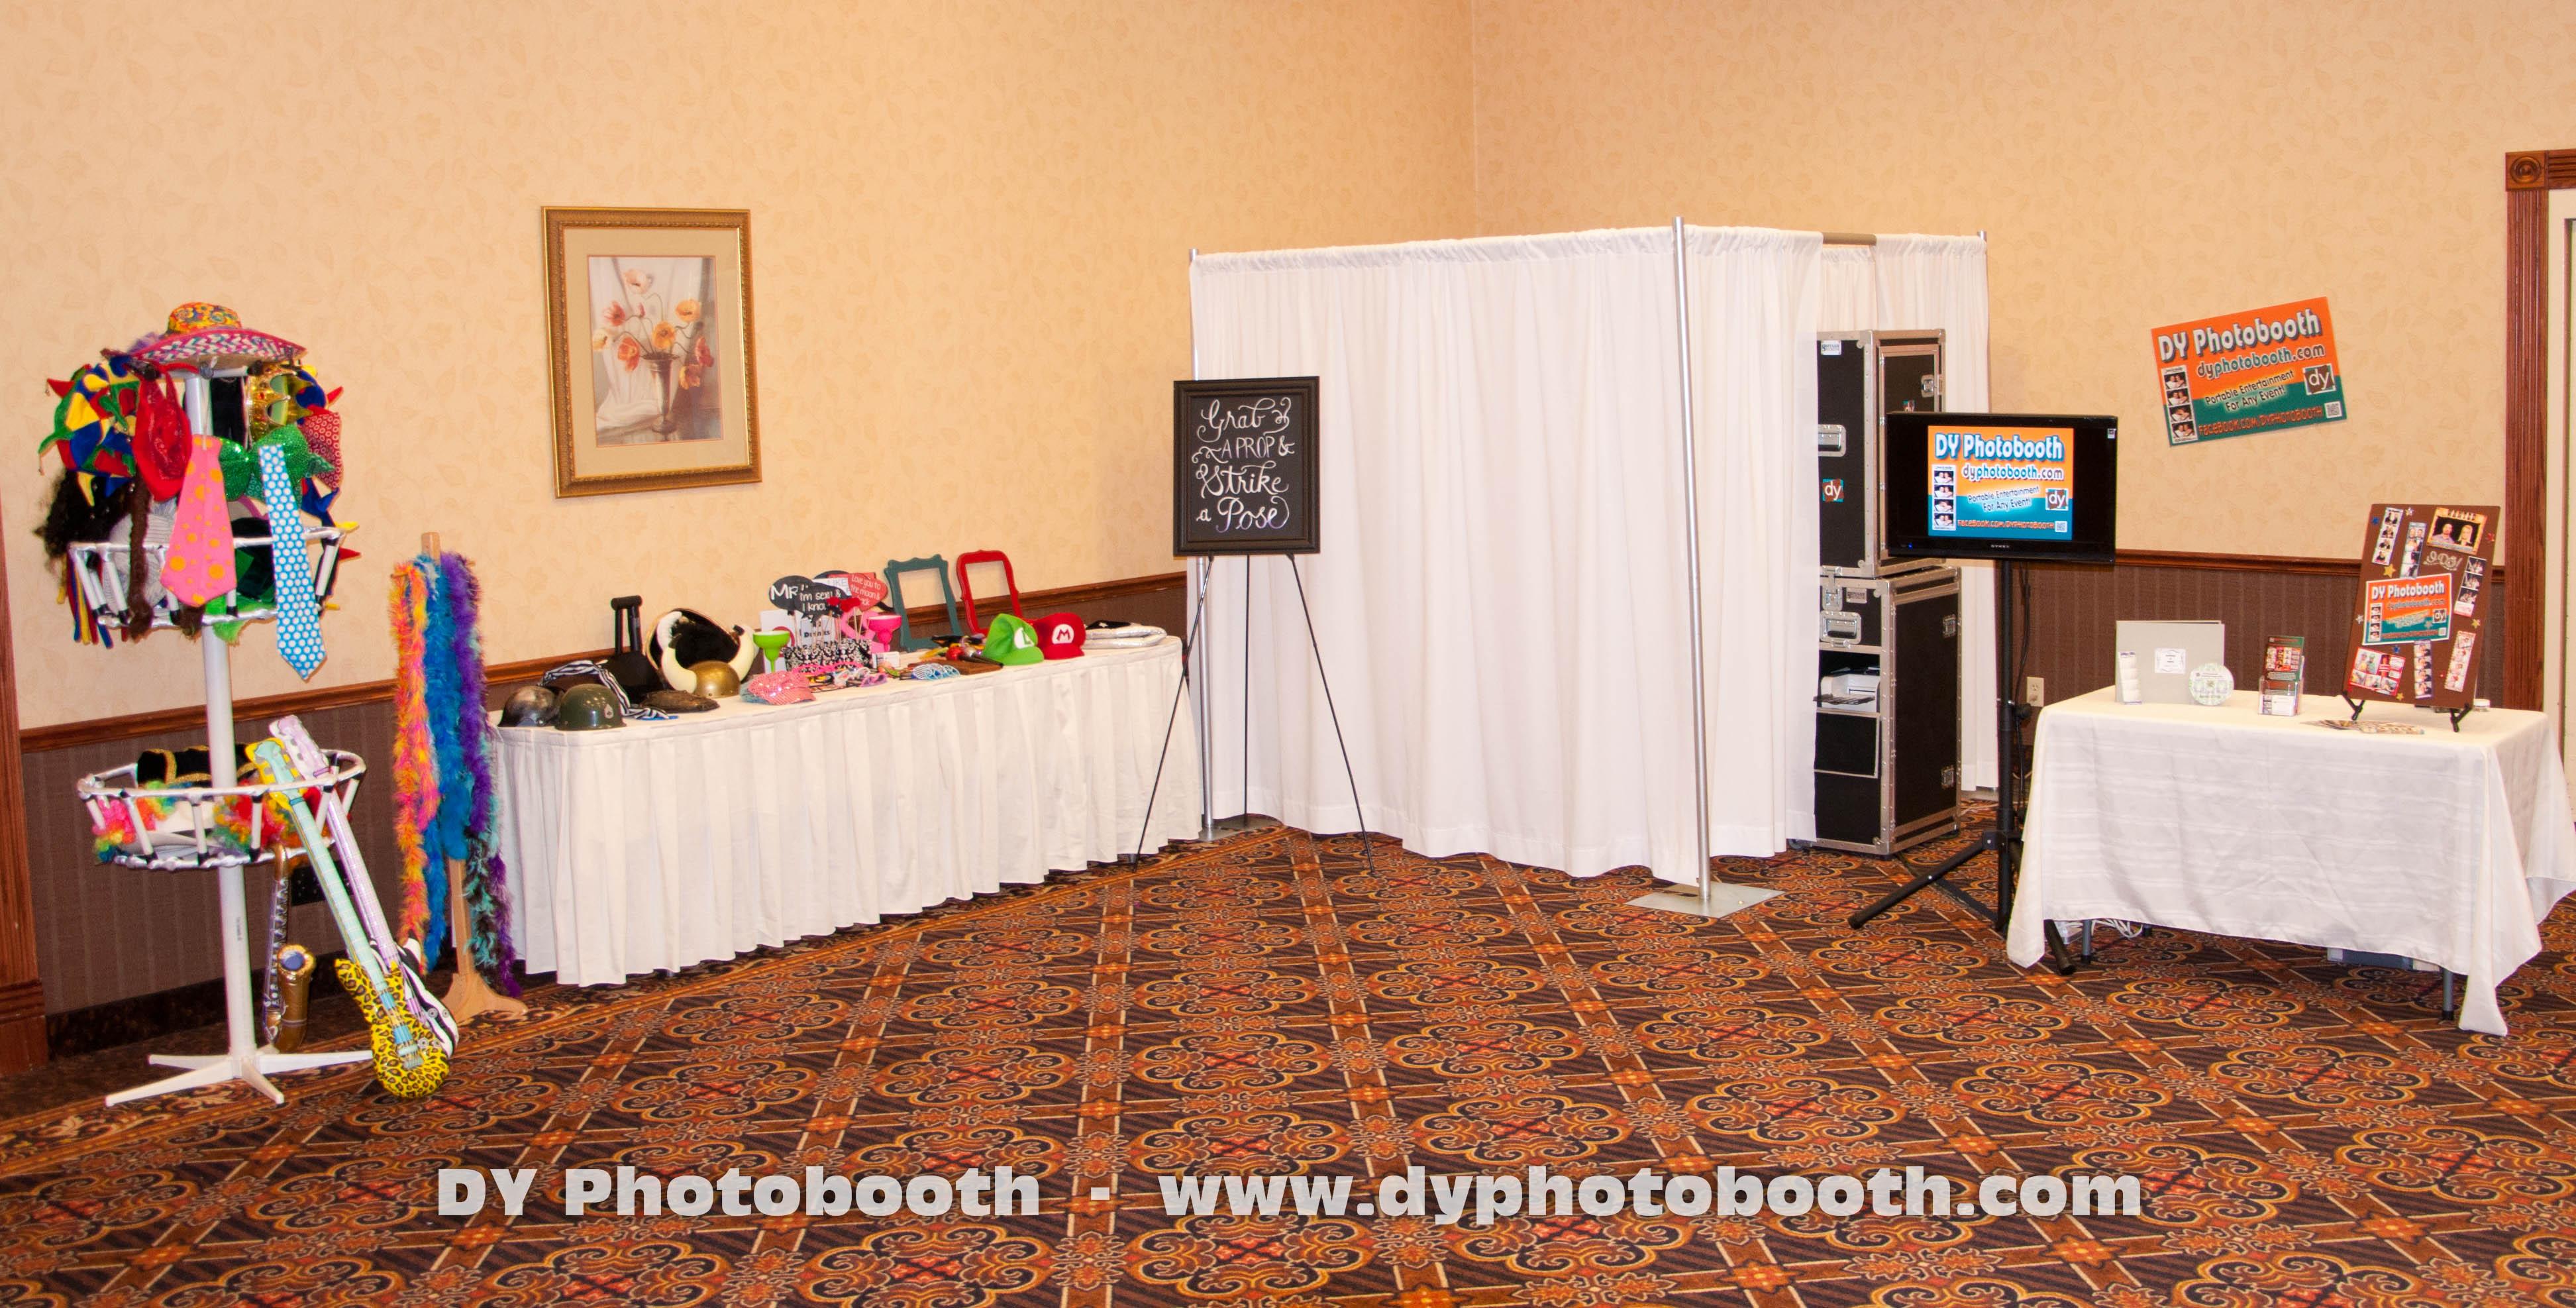 full photobooth photo copy